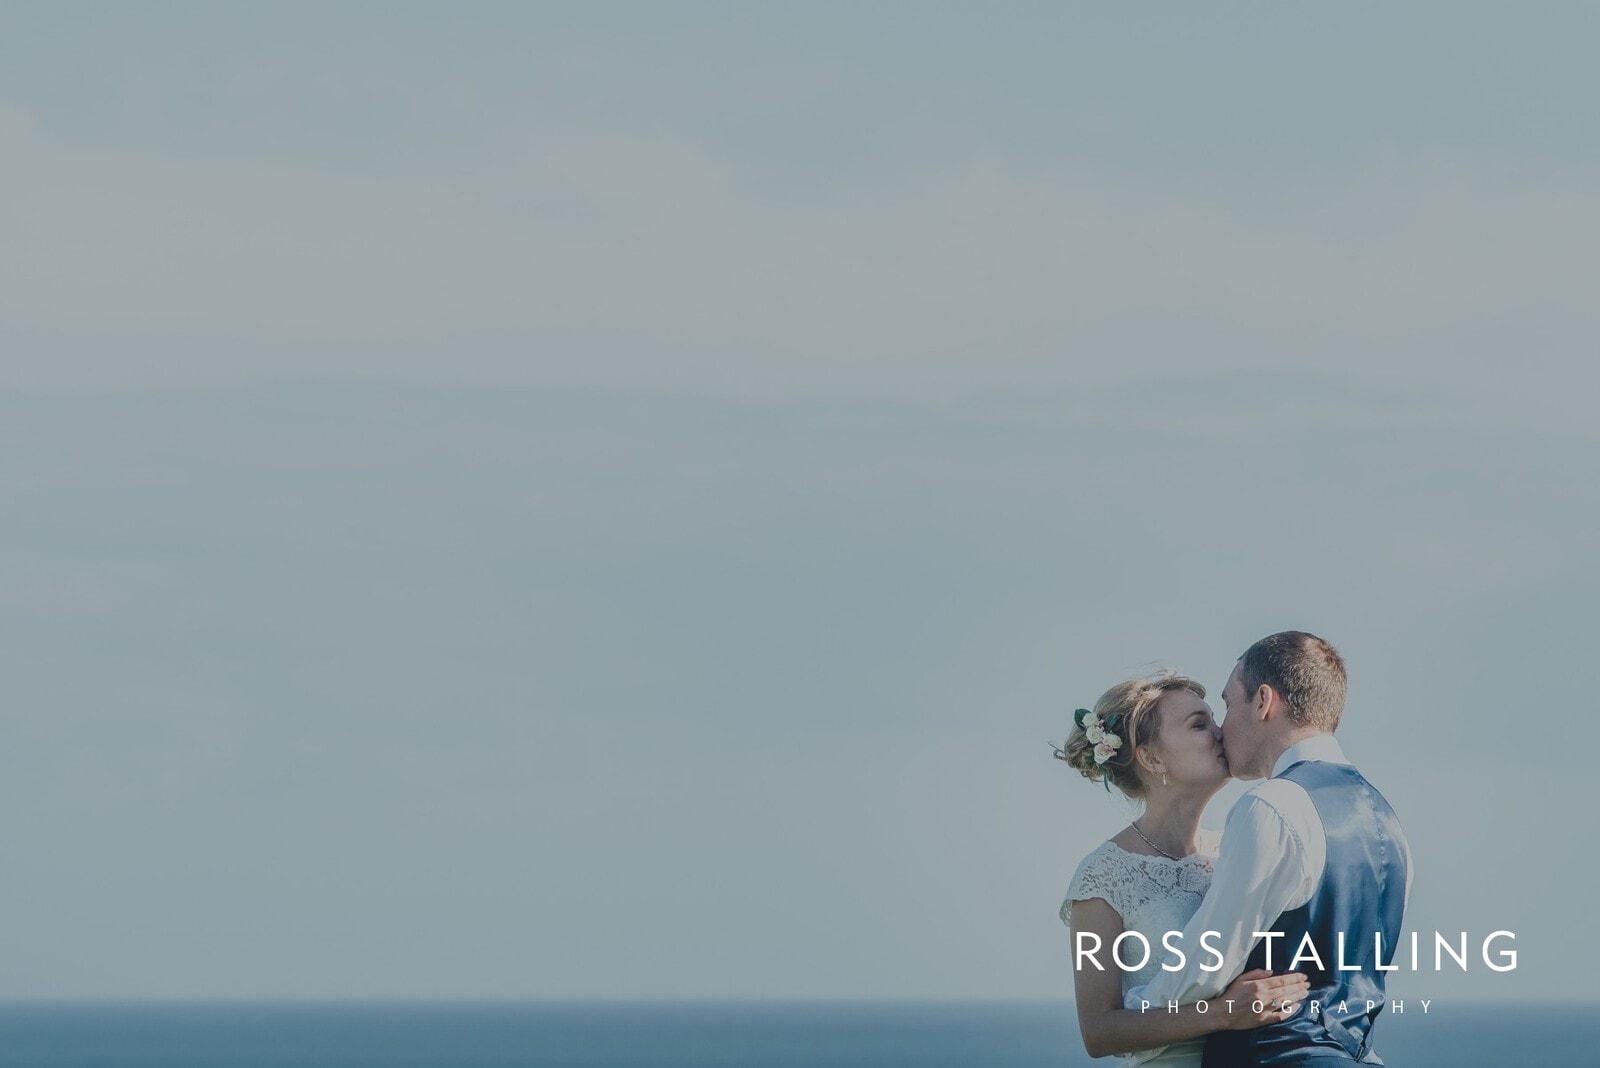 laura-matts-rosevine-hotel-wedding-photography-cornwall_0144